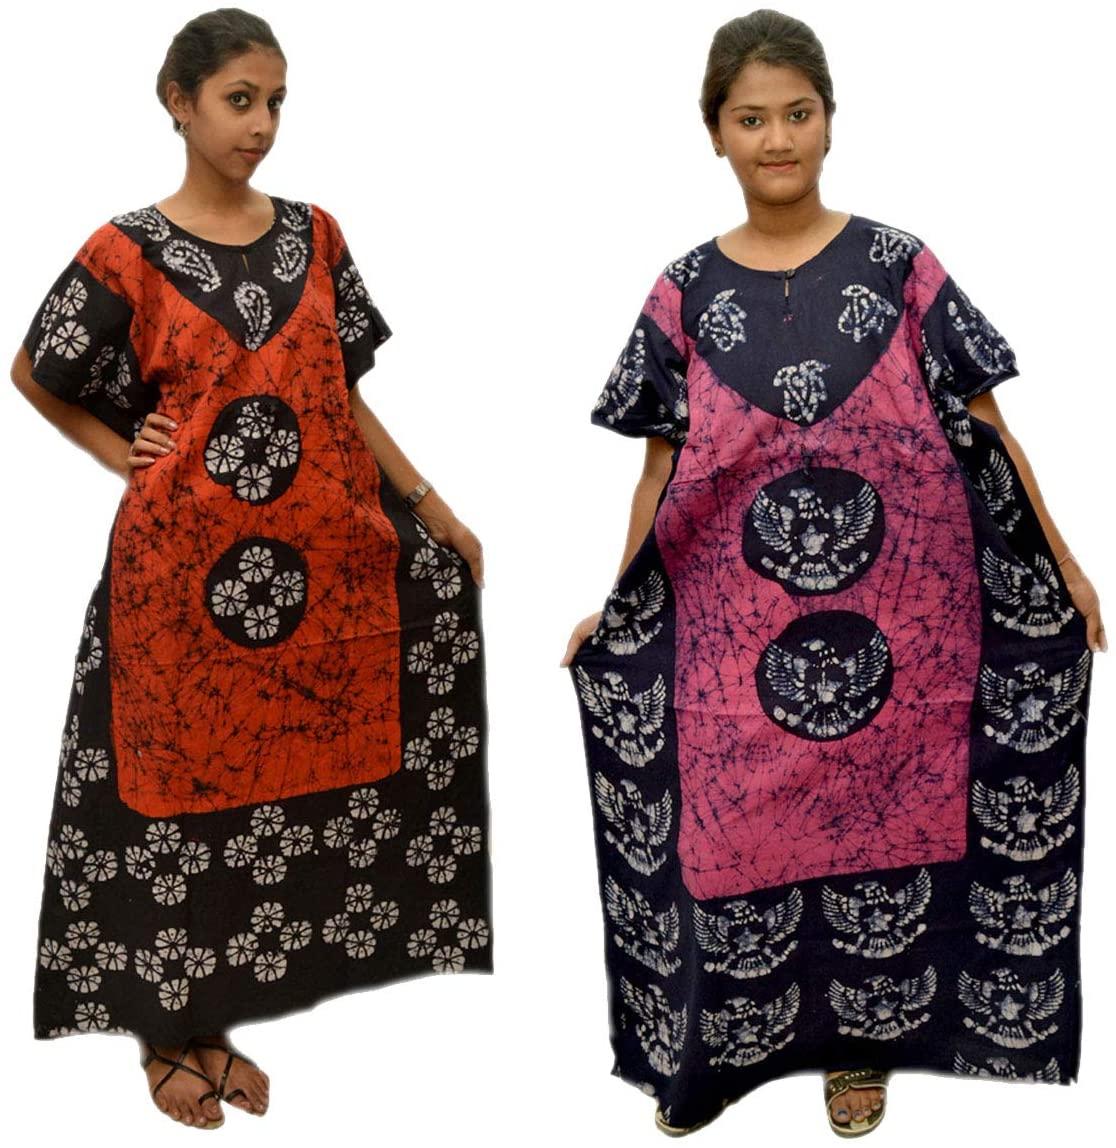 Creativegifts Cotton Caftan/Kaftan Combo 2 Indian Cotton Batik Bohemian Long Dress (feb-33)